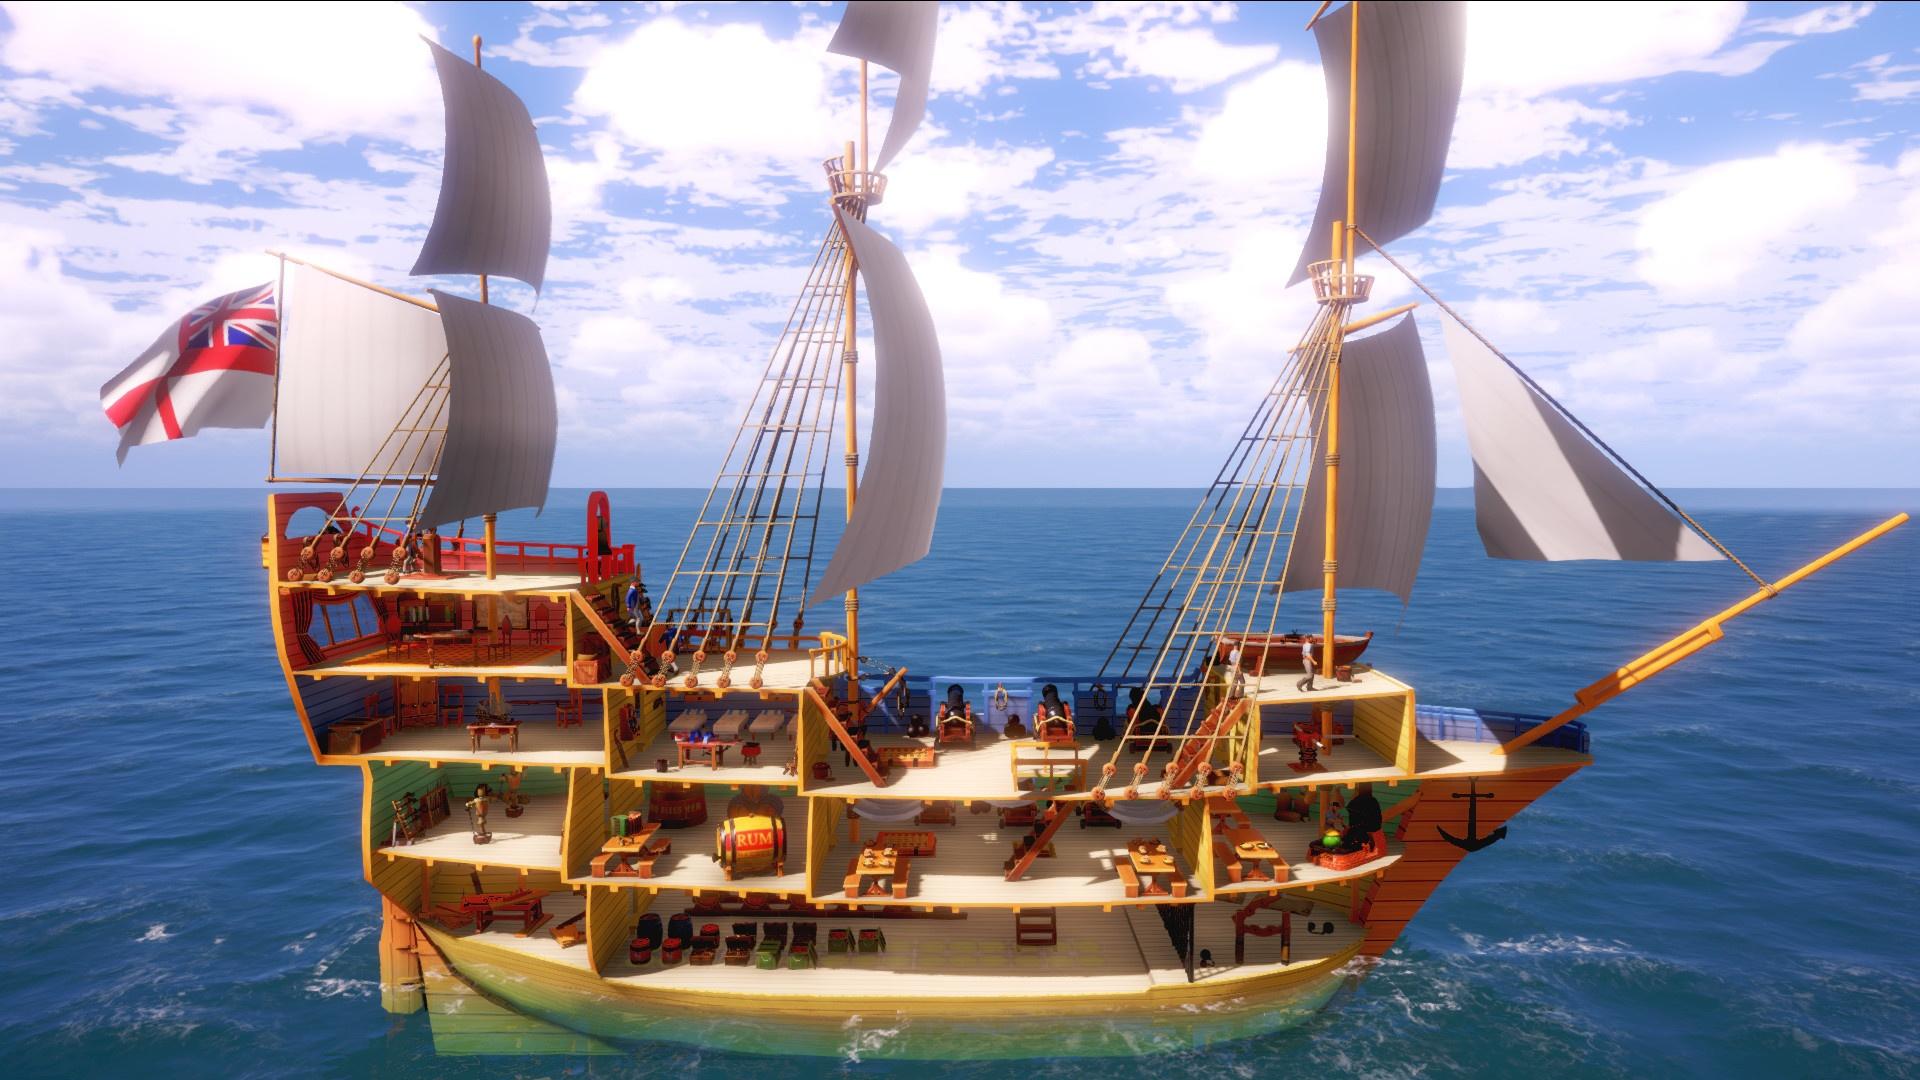 Her Majesty's Ship - Screenshots